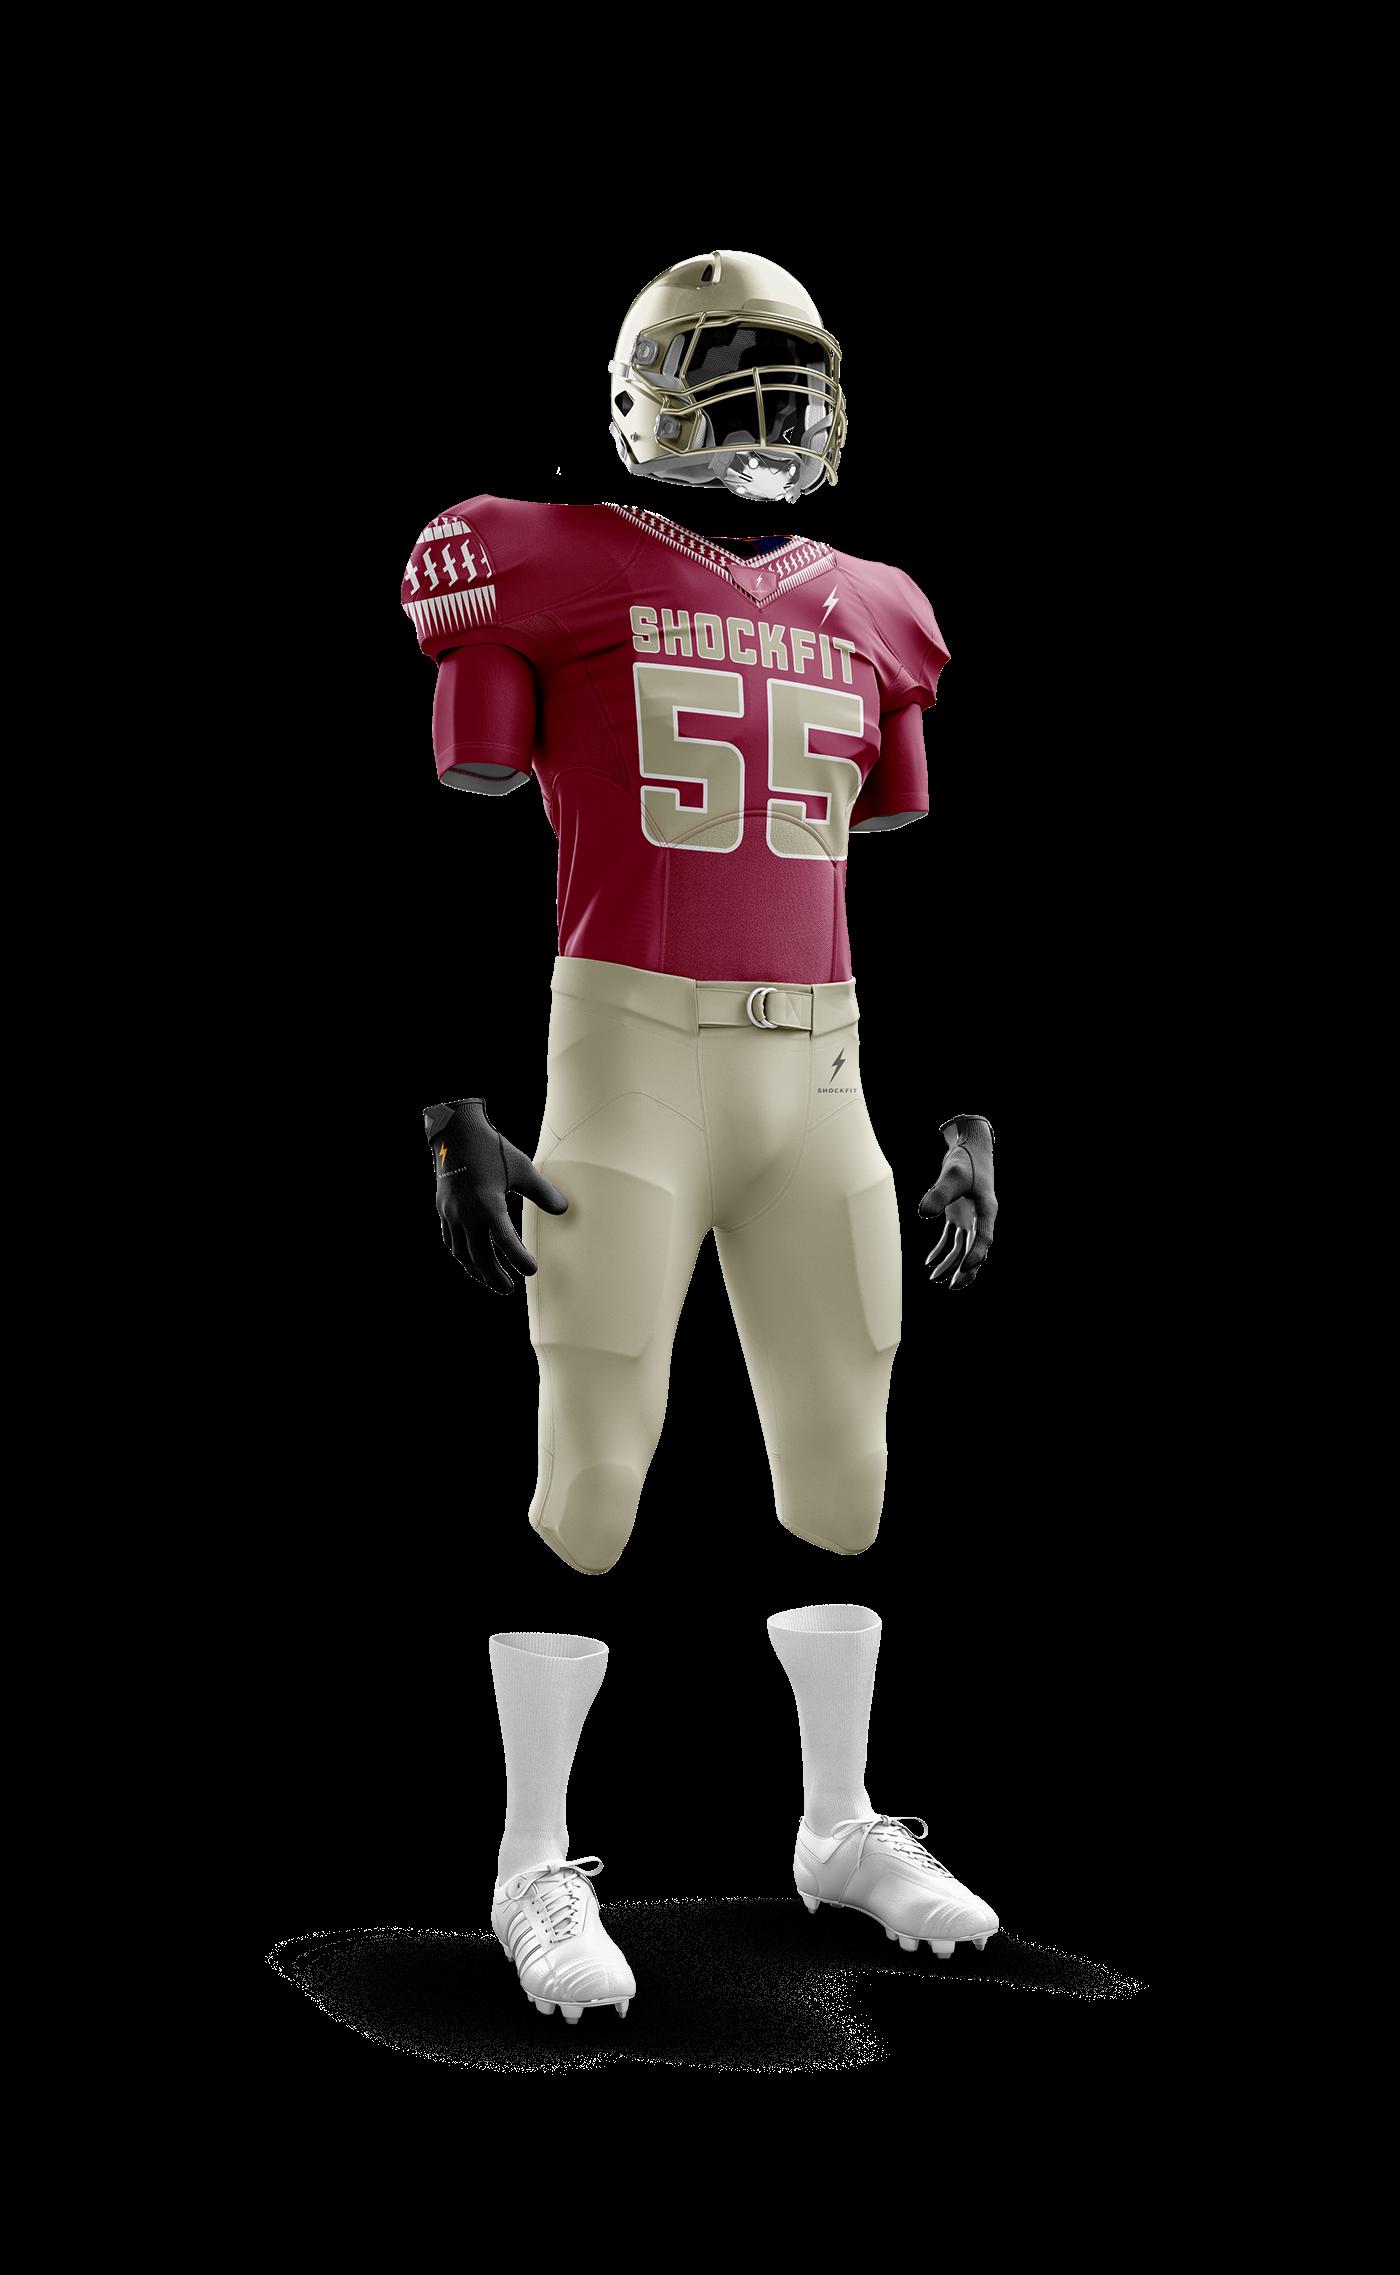 americanfootball football sports shockfit uniform 3d